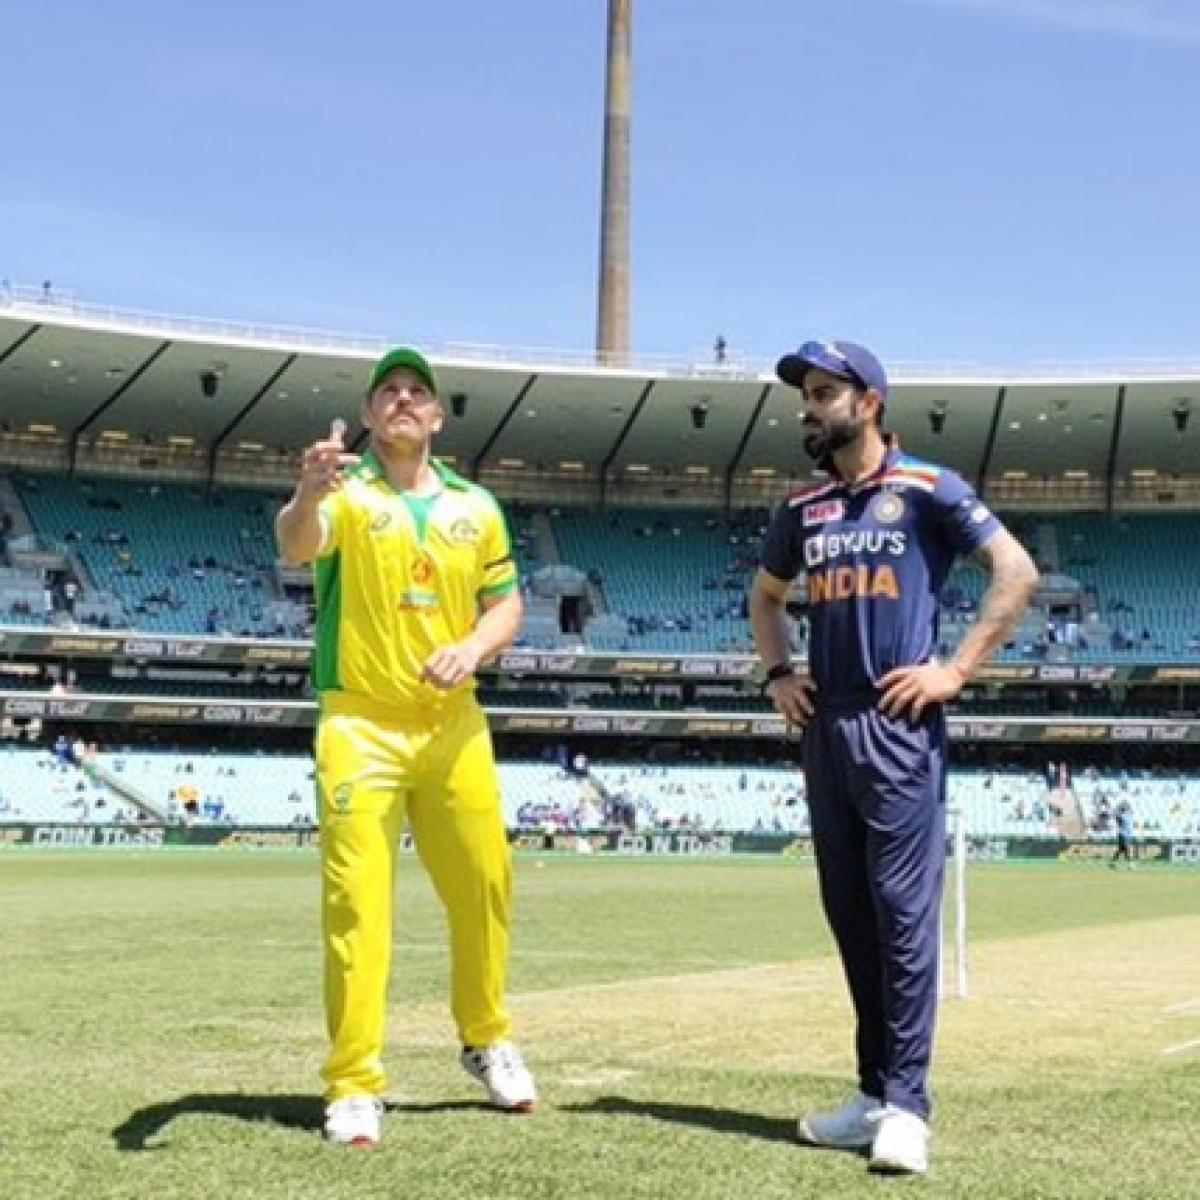 India vs Australia 1st ODI: Australia wins toss, opts to bat first against India at Sydney